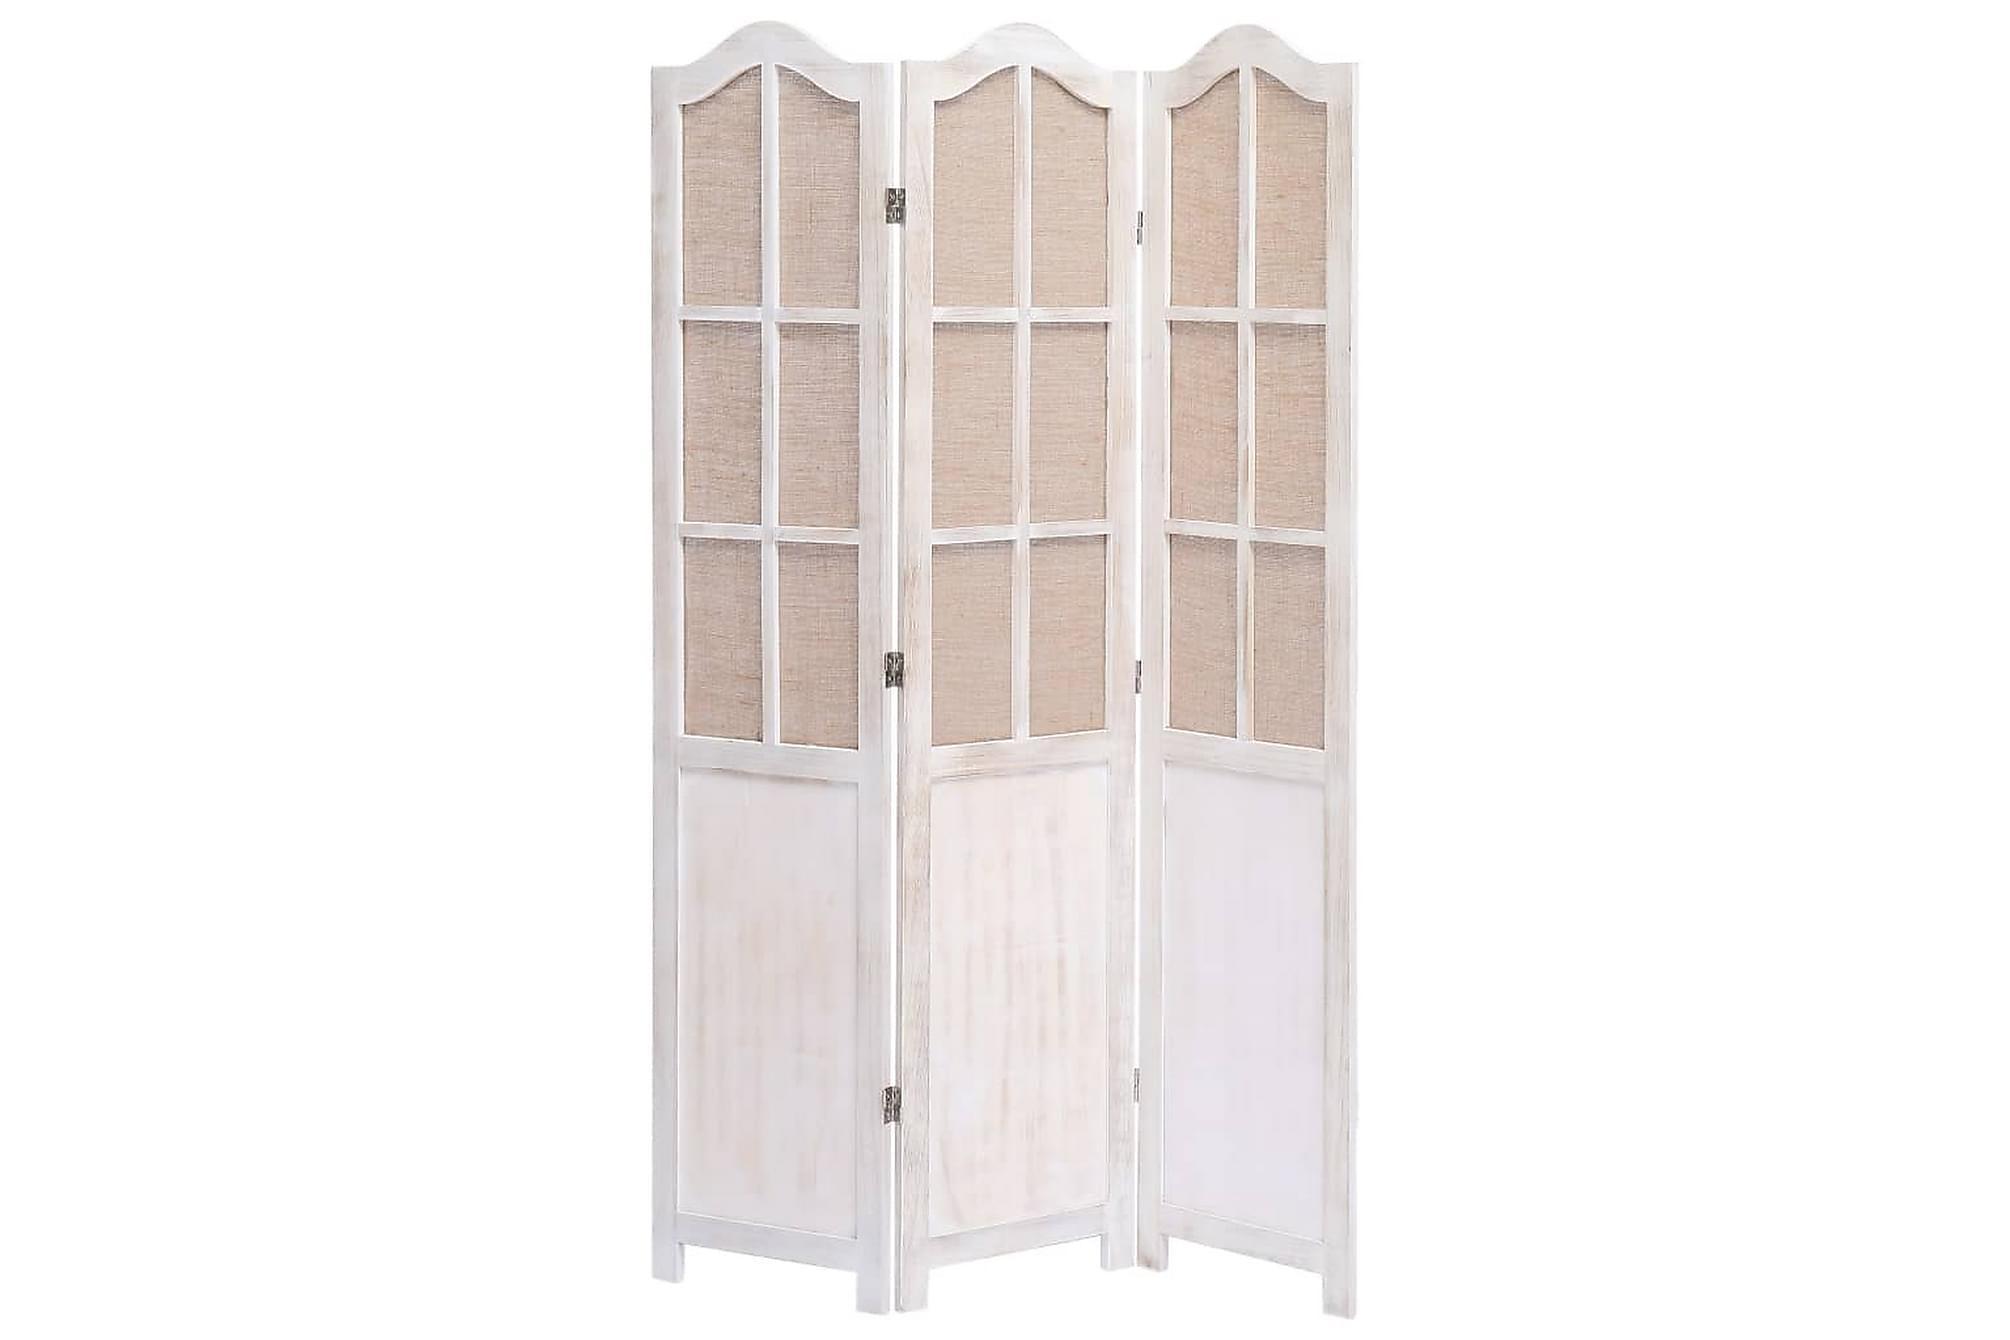 Rumsavdelare 3 paneler vit 105×165 cm tyg